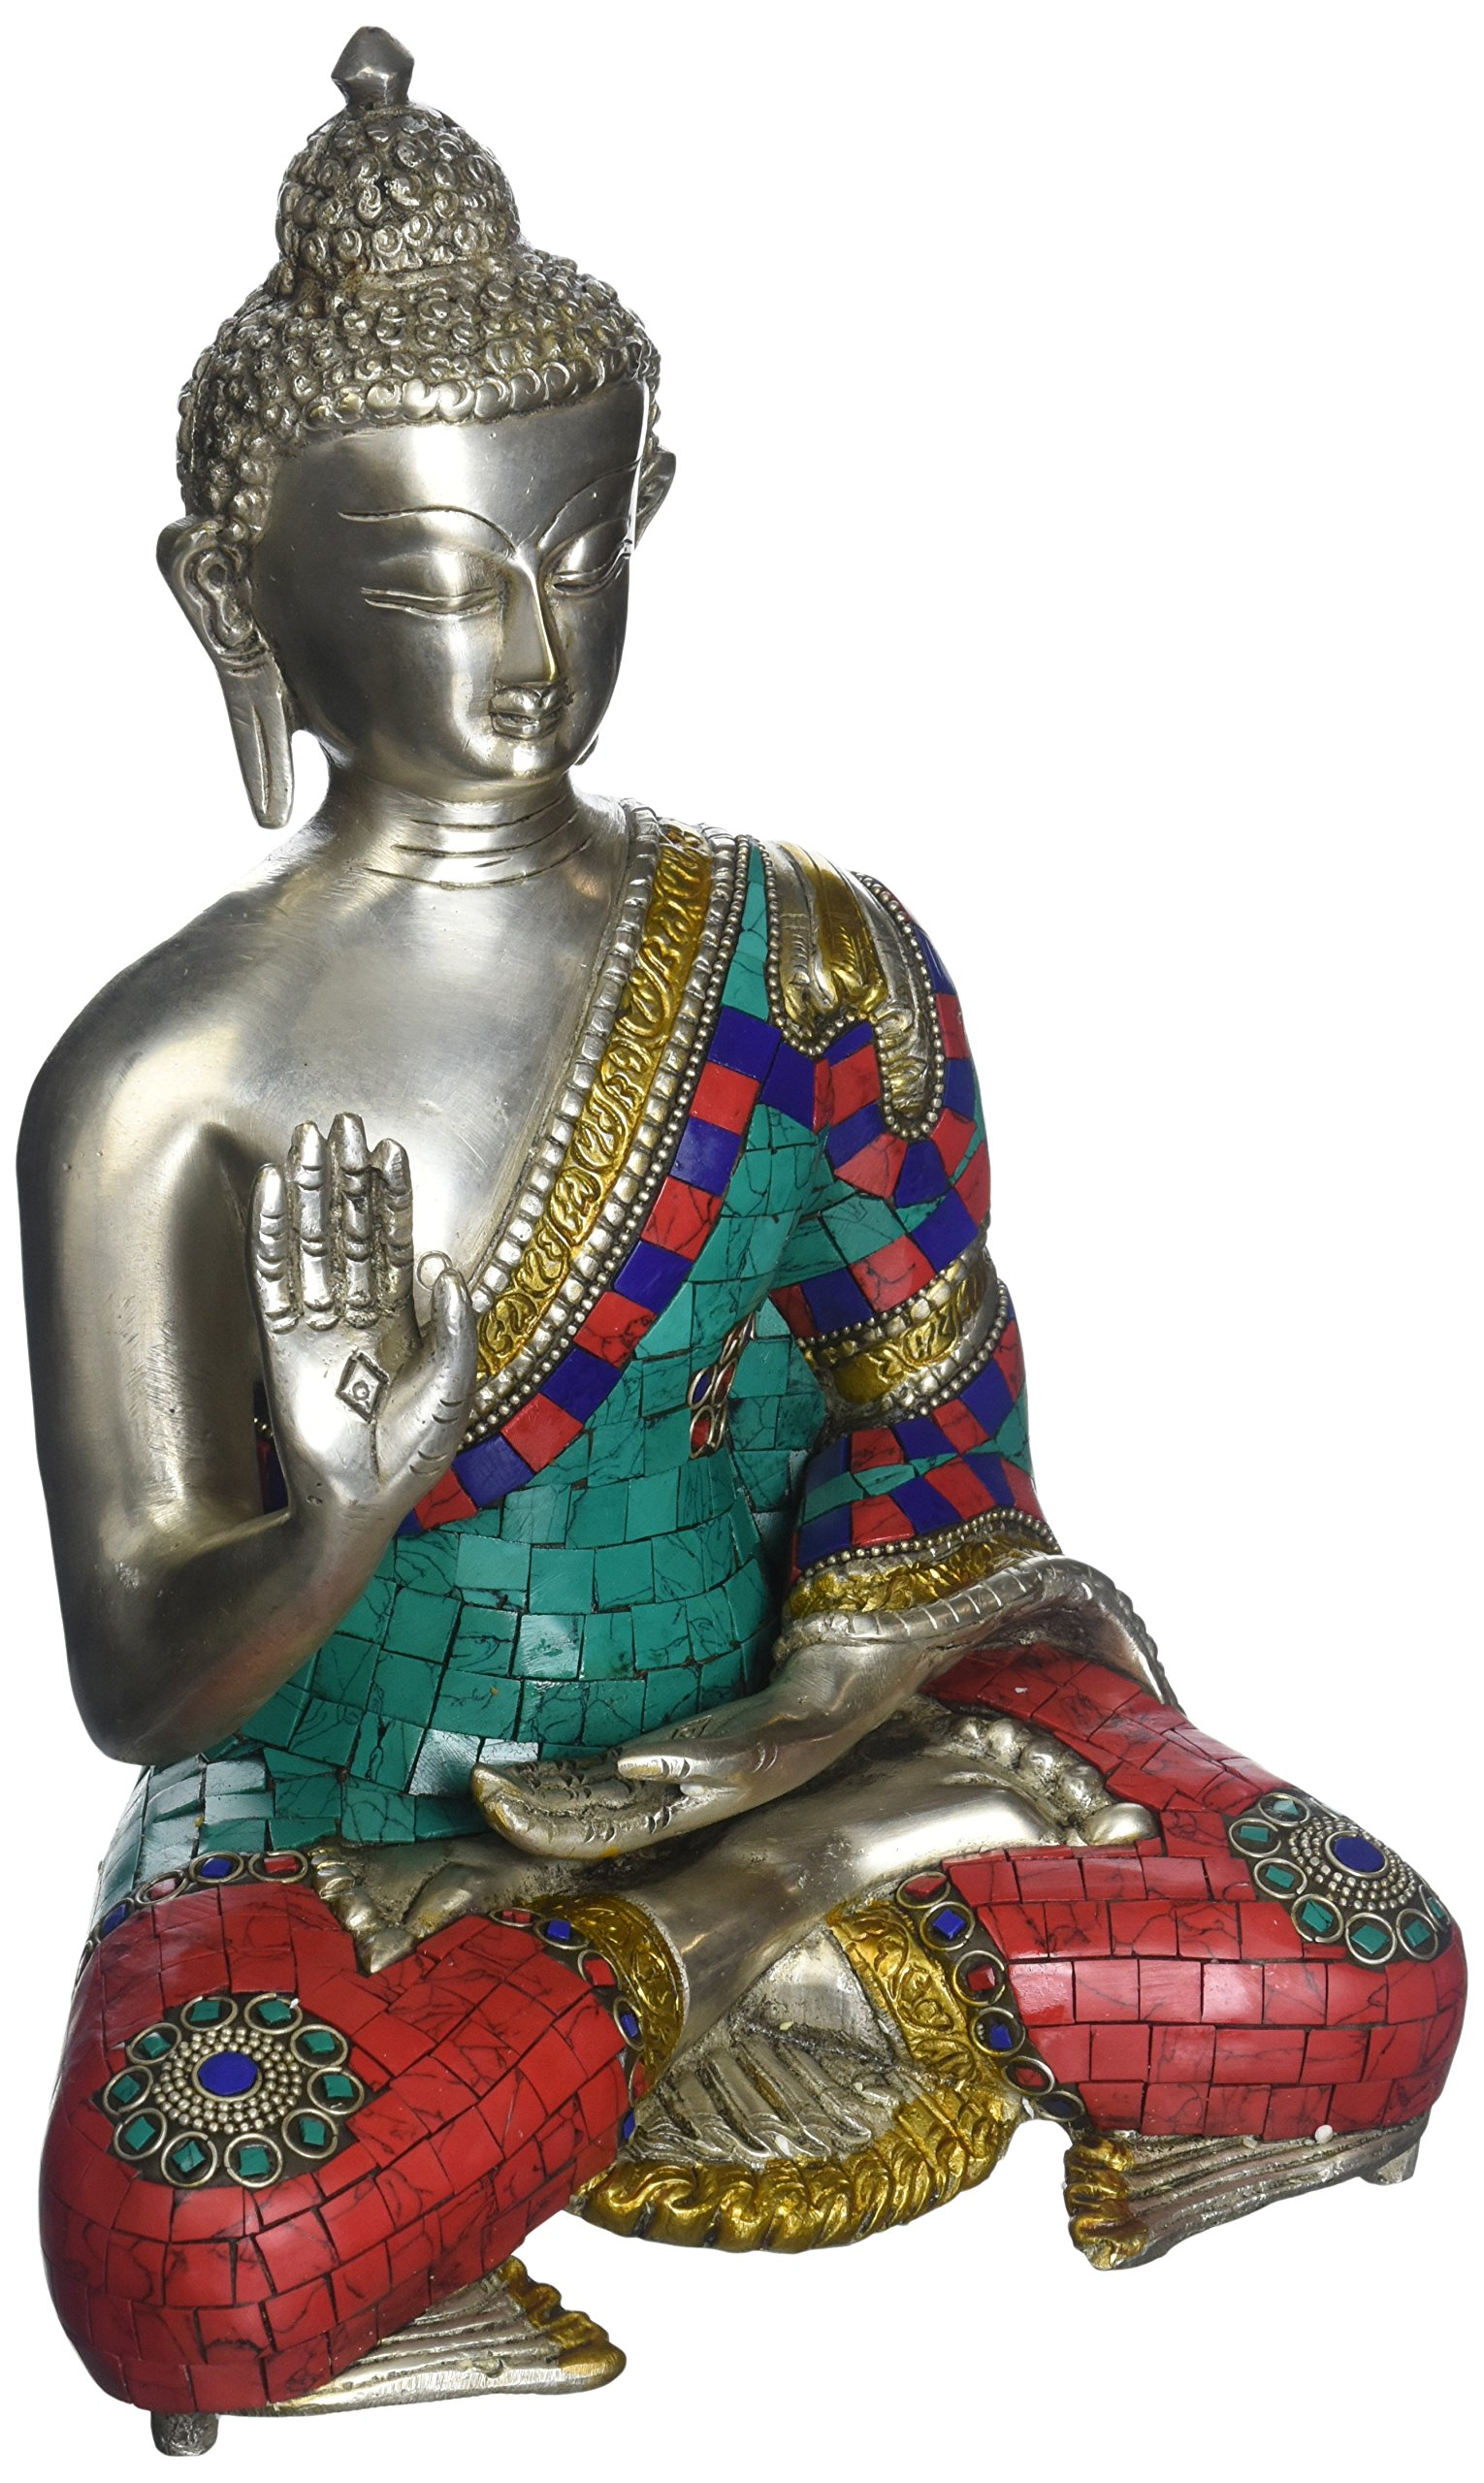 Aone India 11'' Abhaya Buddha Idol Brass Silver Turquoise Finish Hand Work Tibetan Buddha Statue Decor + Cash Envelope (Pack Of 10)